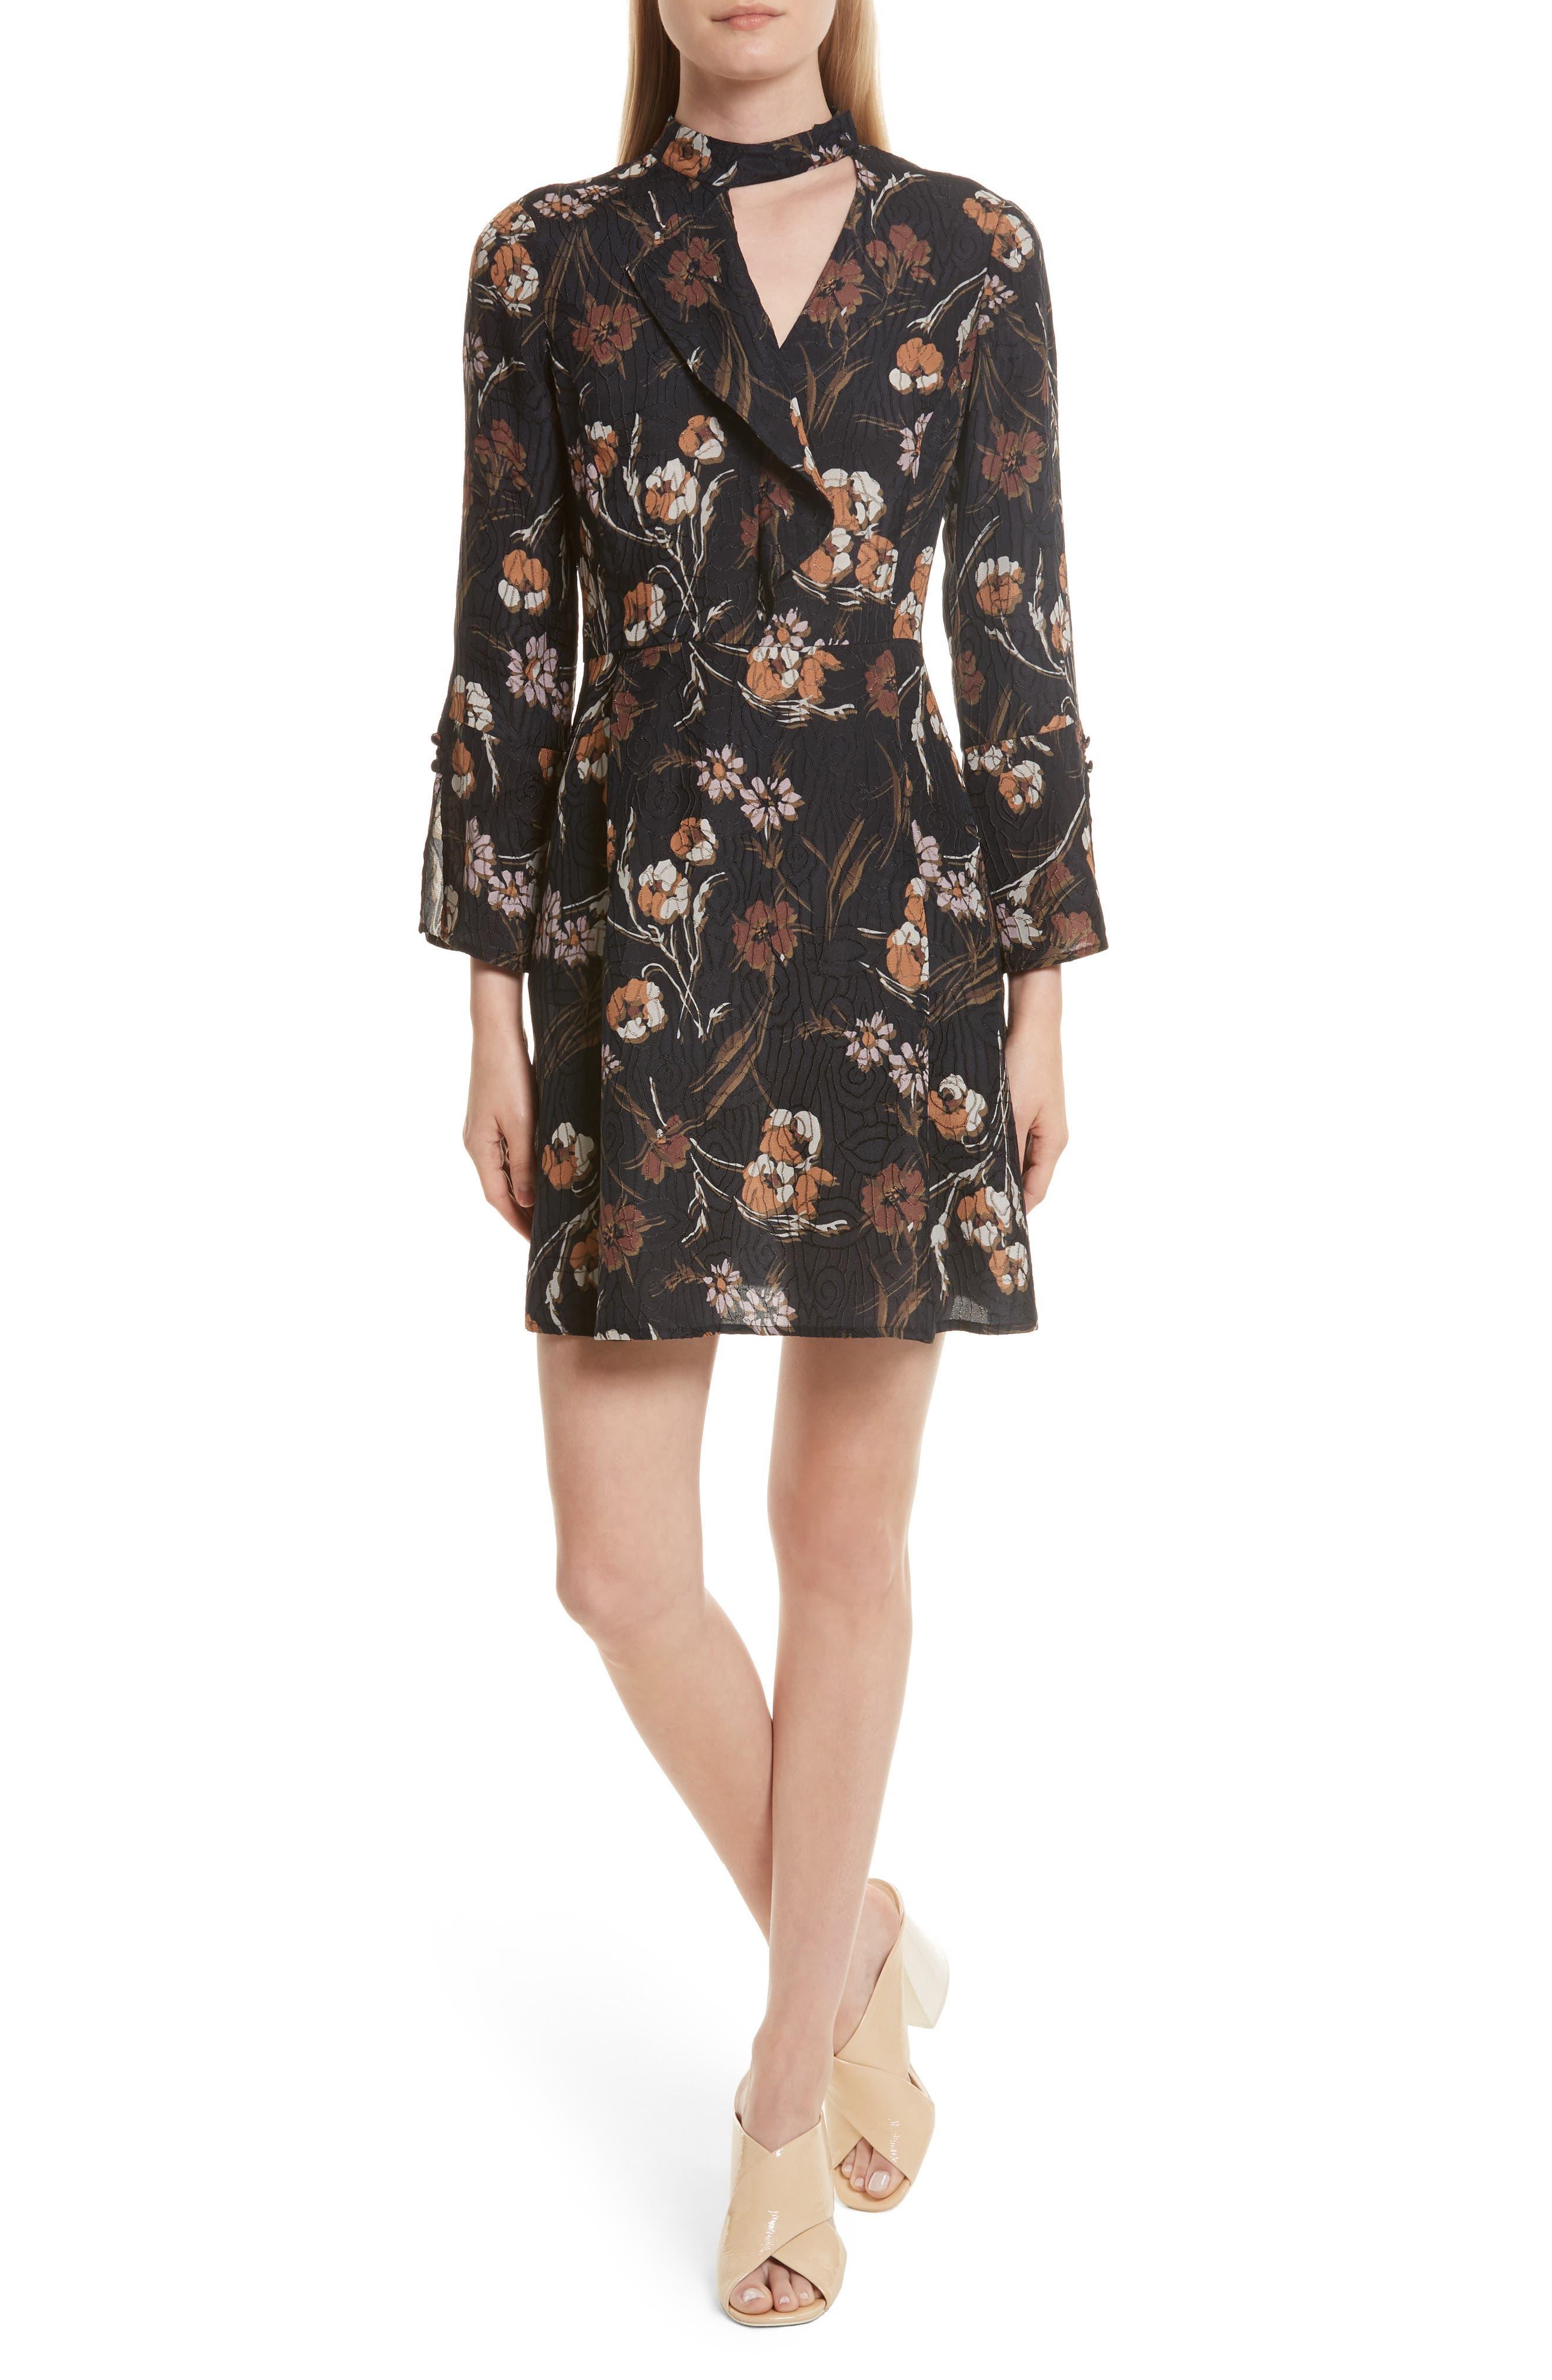 Alternate Image 1 Selected - Derek Lam 10 Crosby Cascade Floral Silk Blend Dress